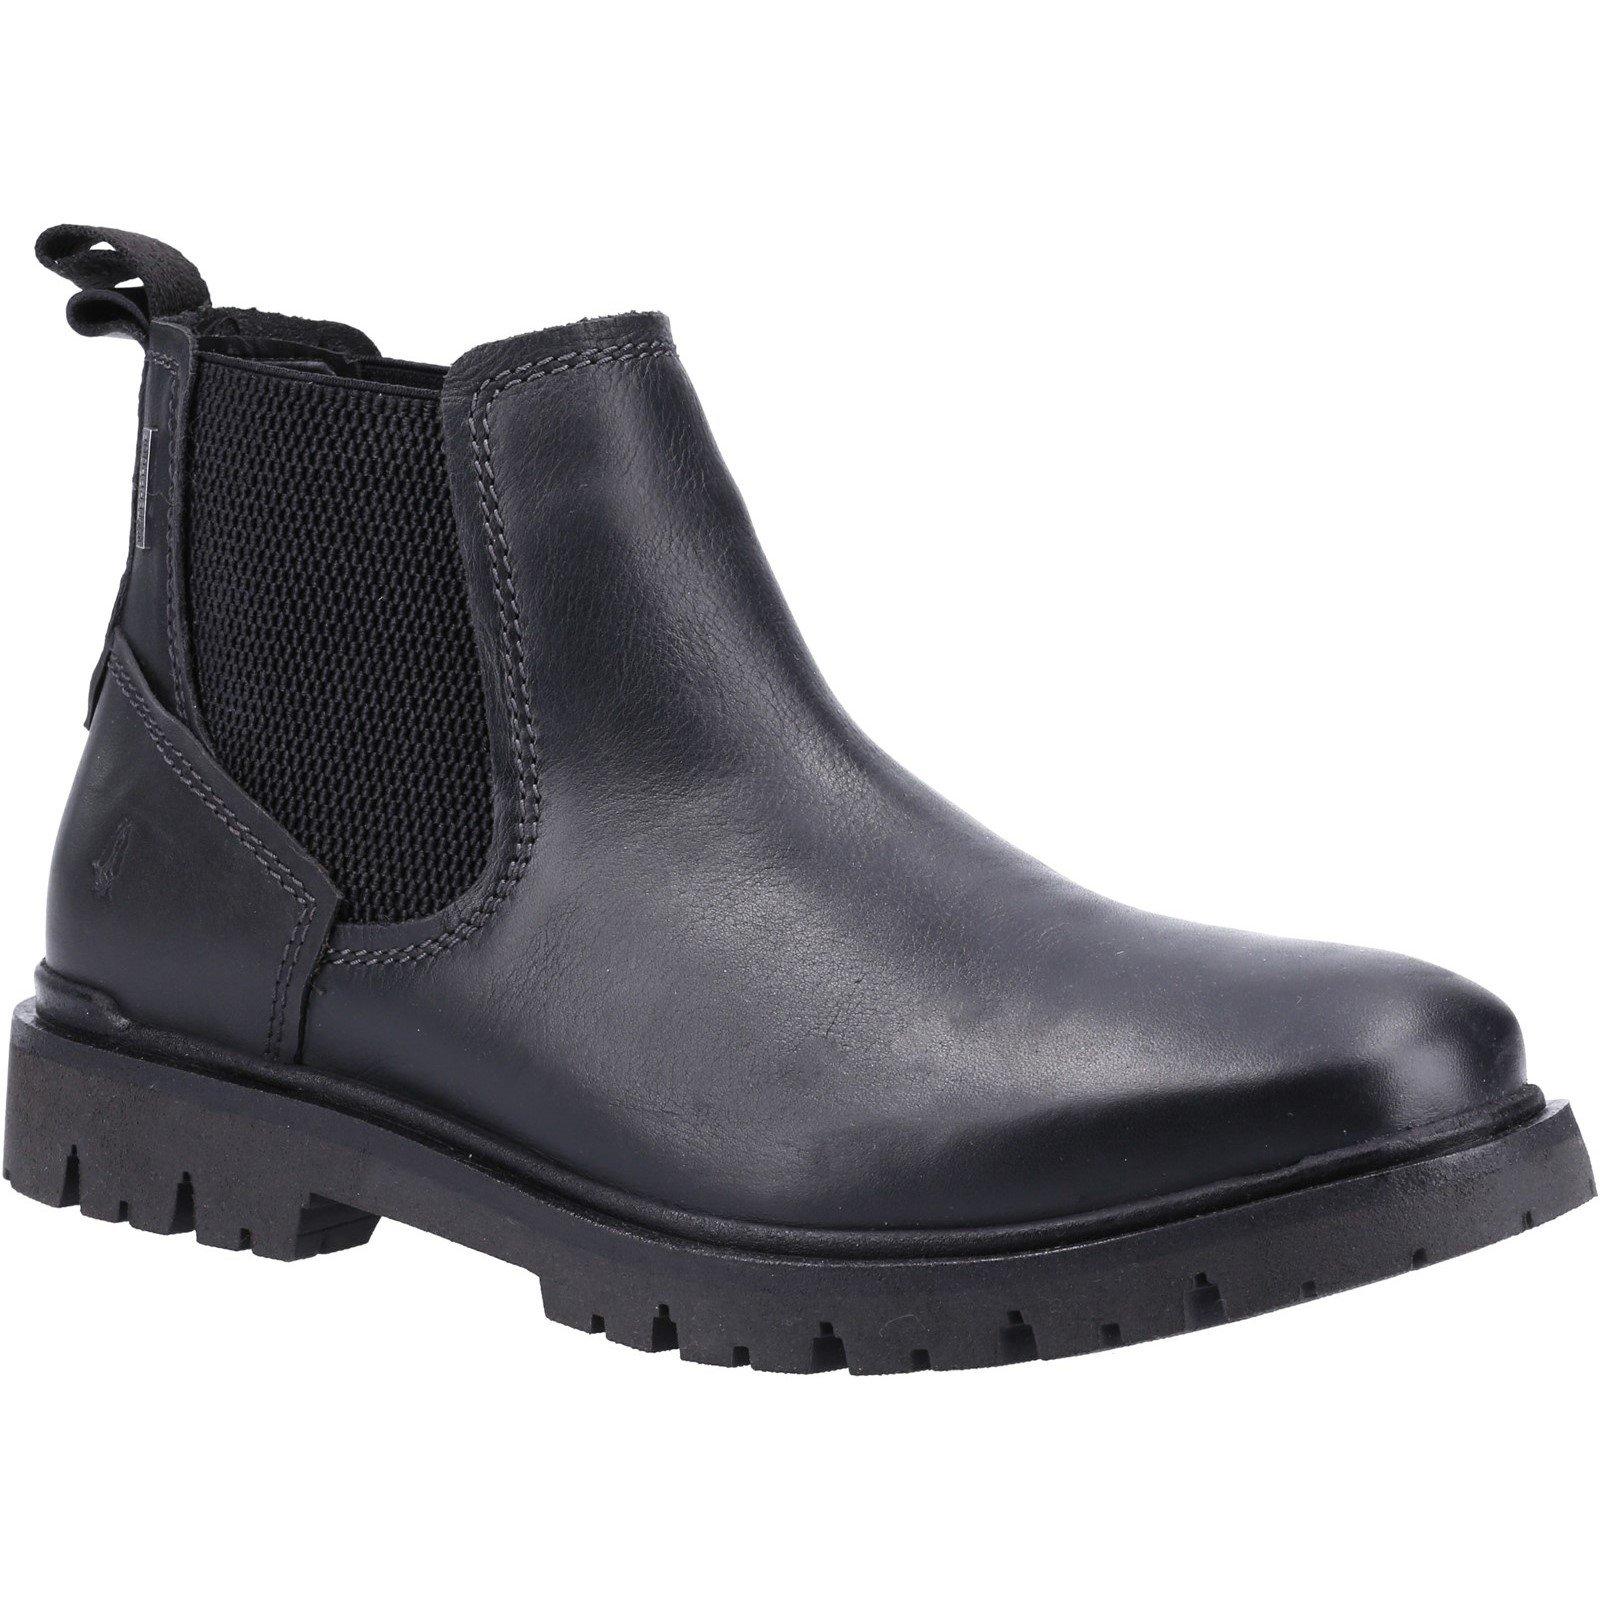 Hush Puppies Men's Paxton Chelsea Boot Various Colours 32882 - Black 8